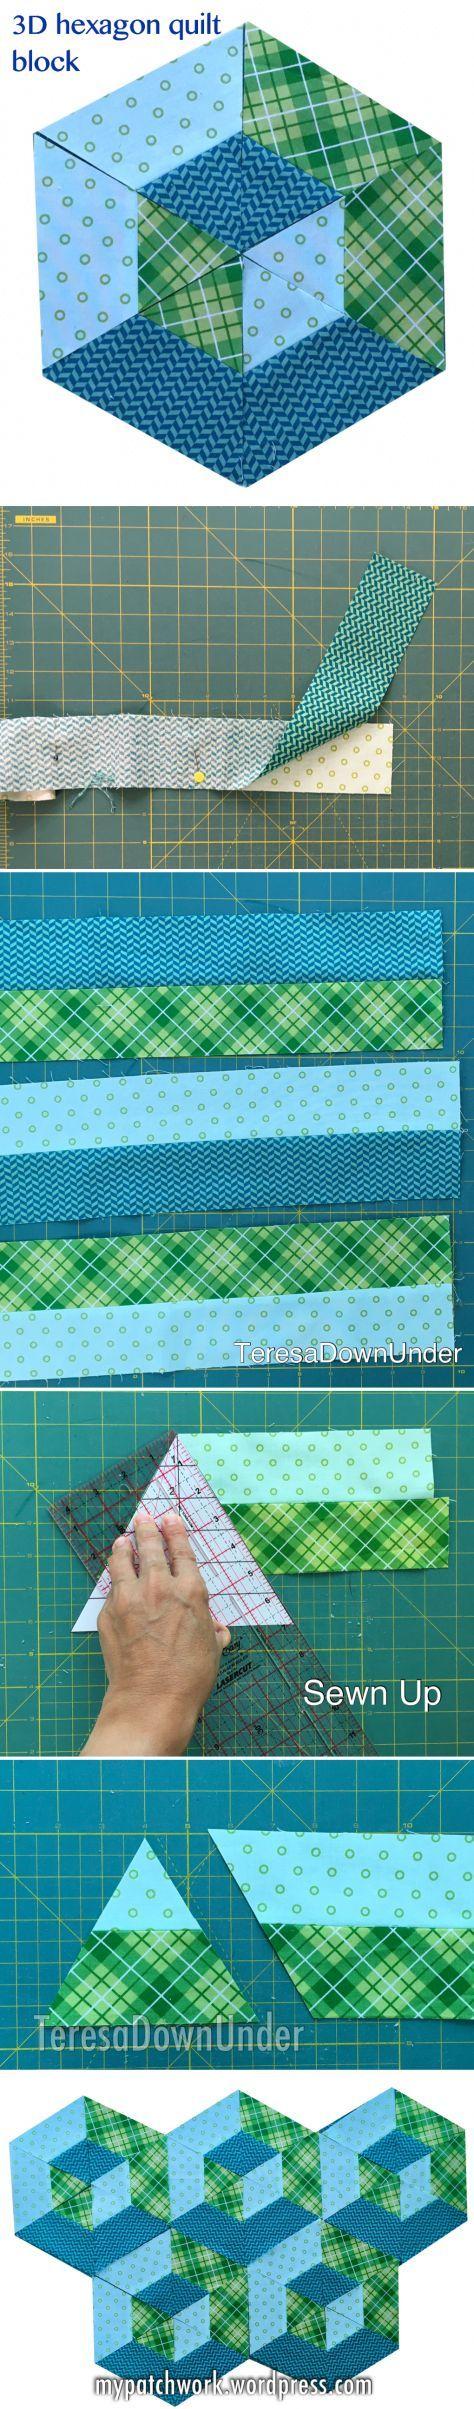 Best 25+ Quilting ideas ideas on Pinterest | Quilting, Baby quilt ... : quilts ideas - Adamdwight.com